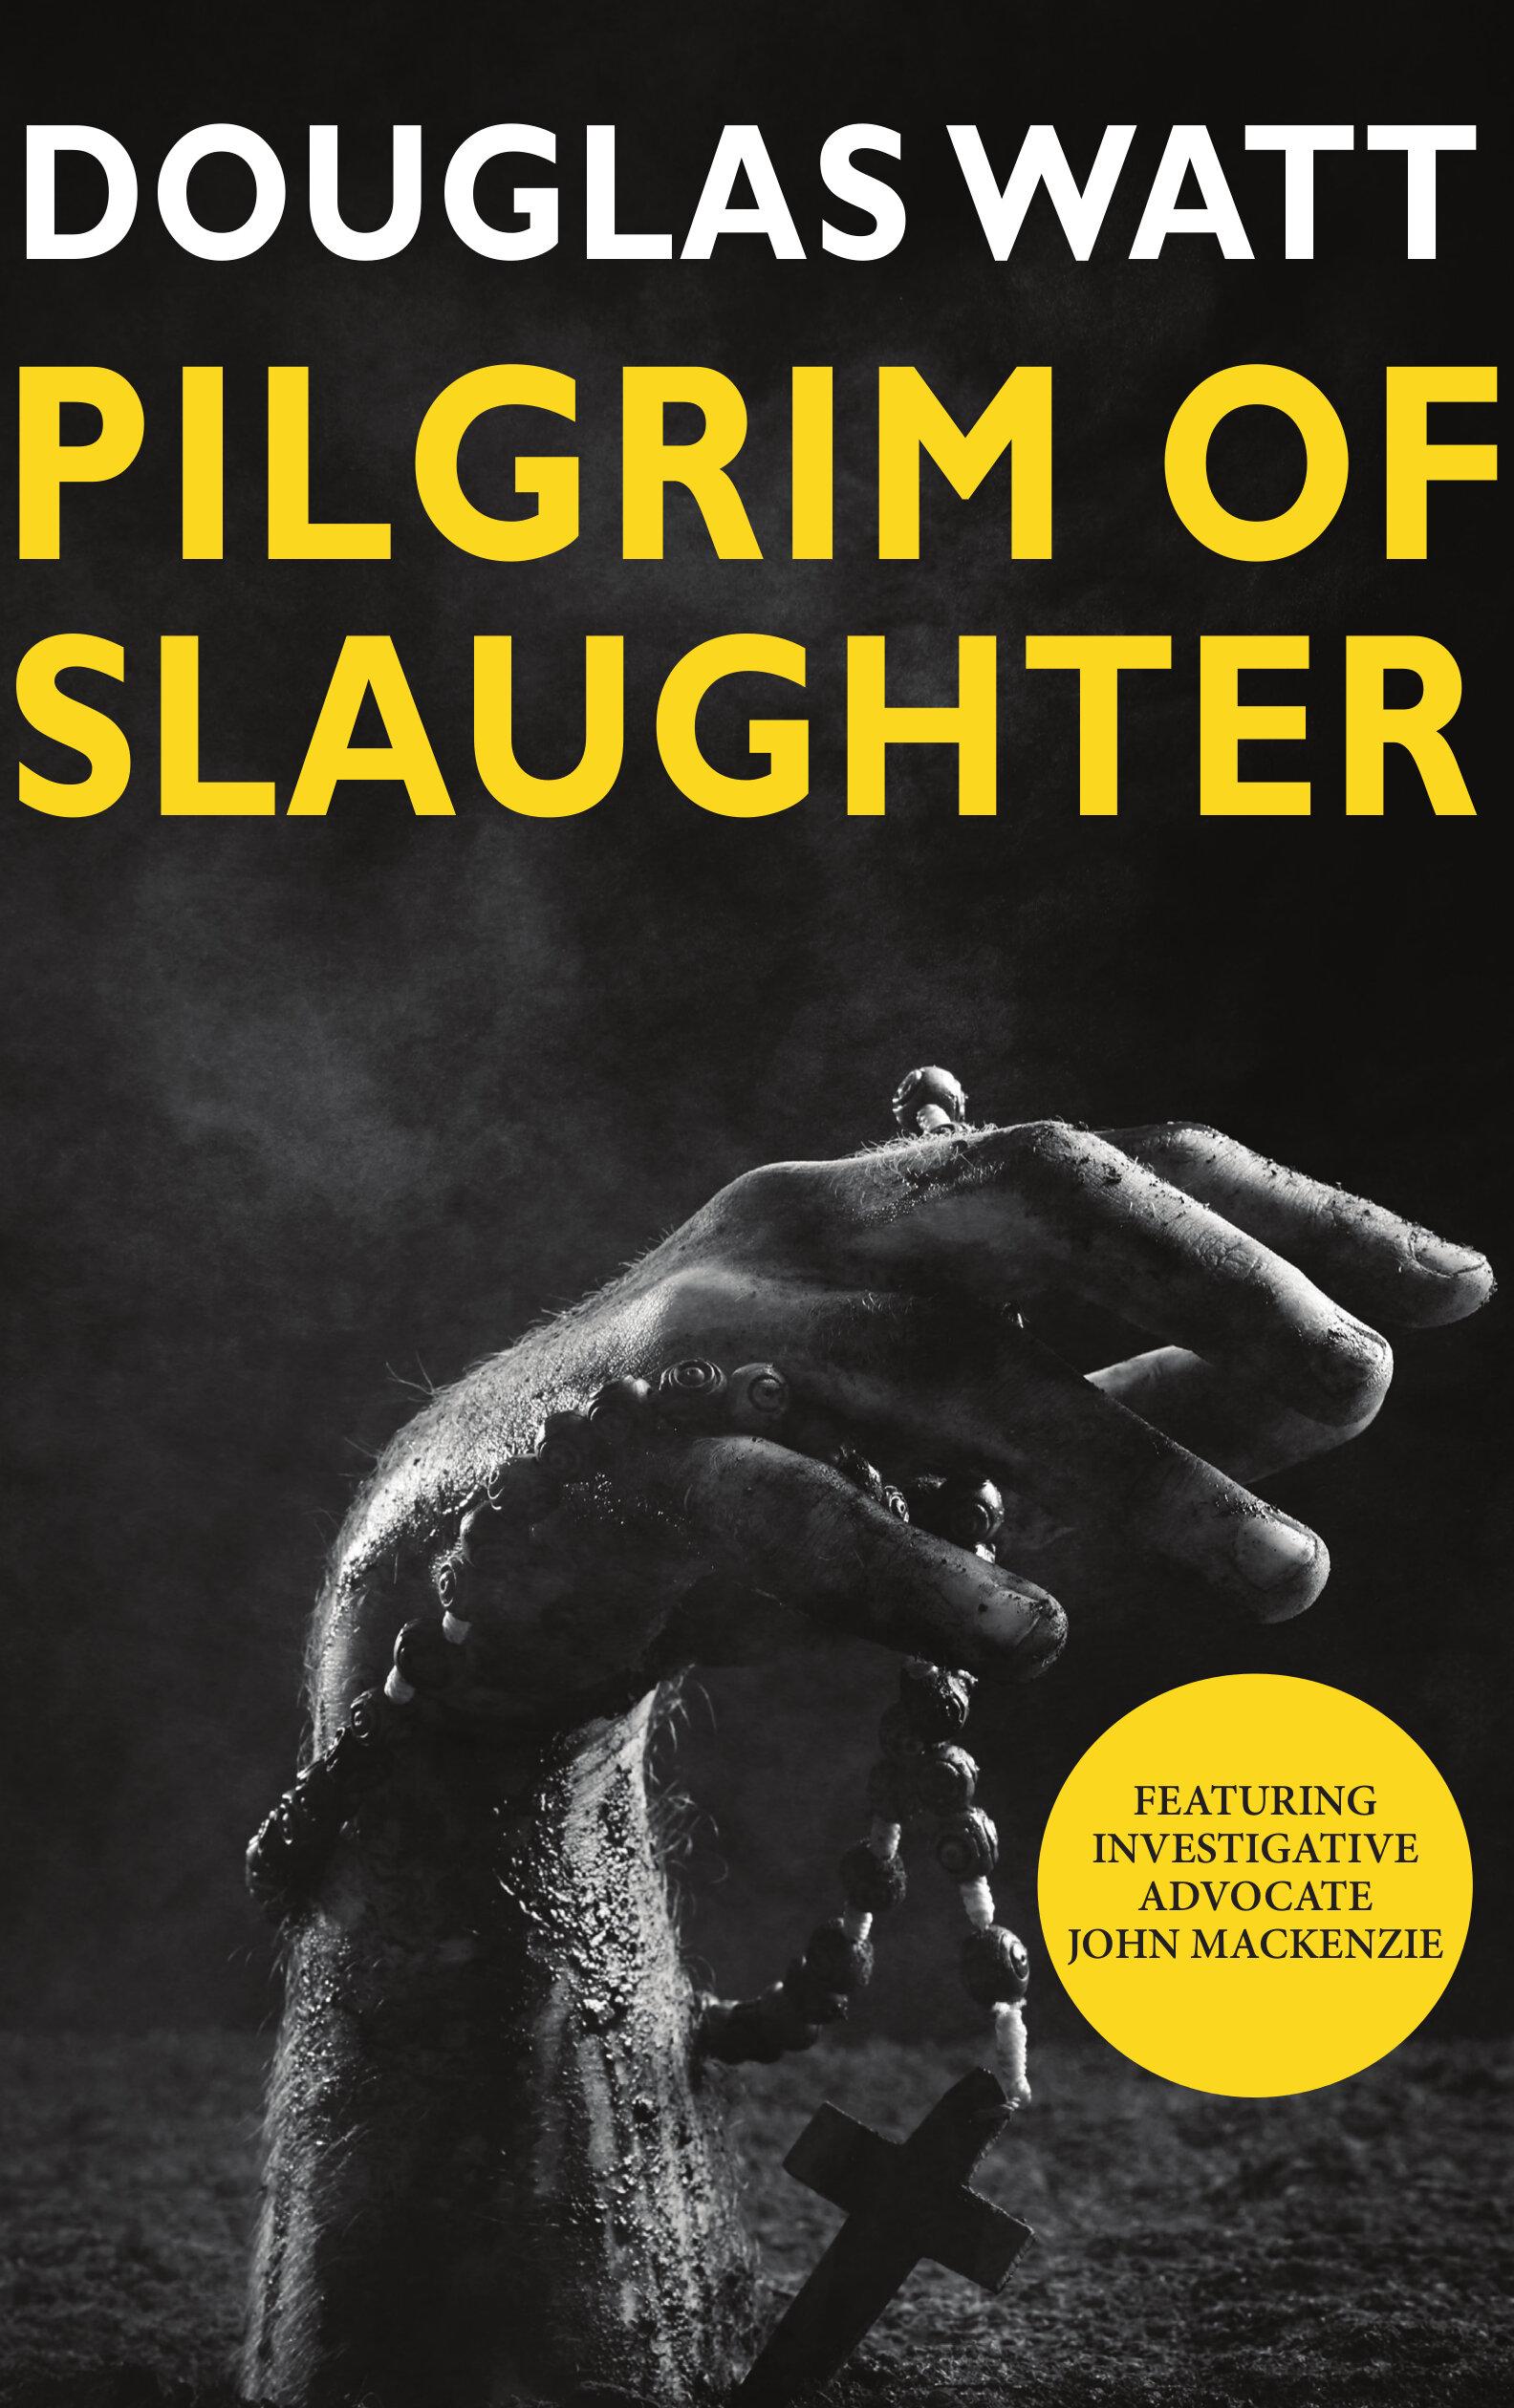 Pilgrim of Slaughter Douglas Watt 9781913025298 Luath Press.jpg